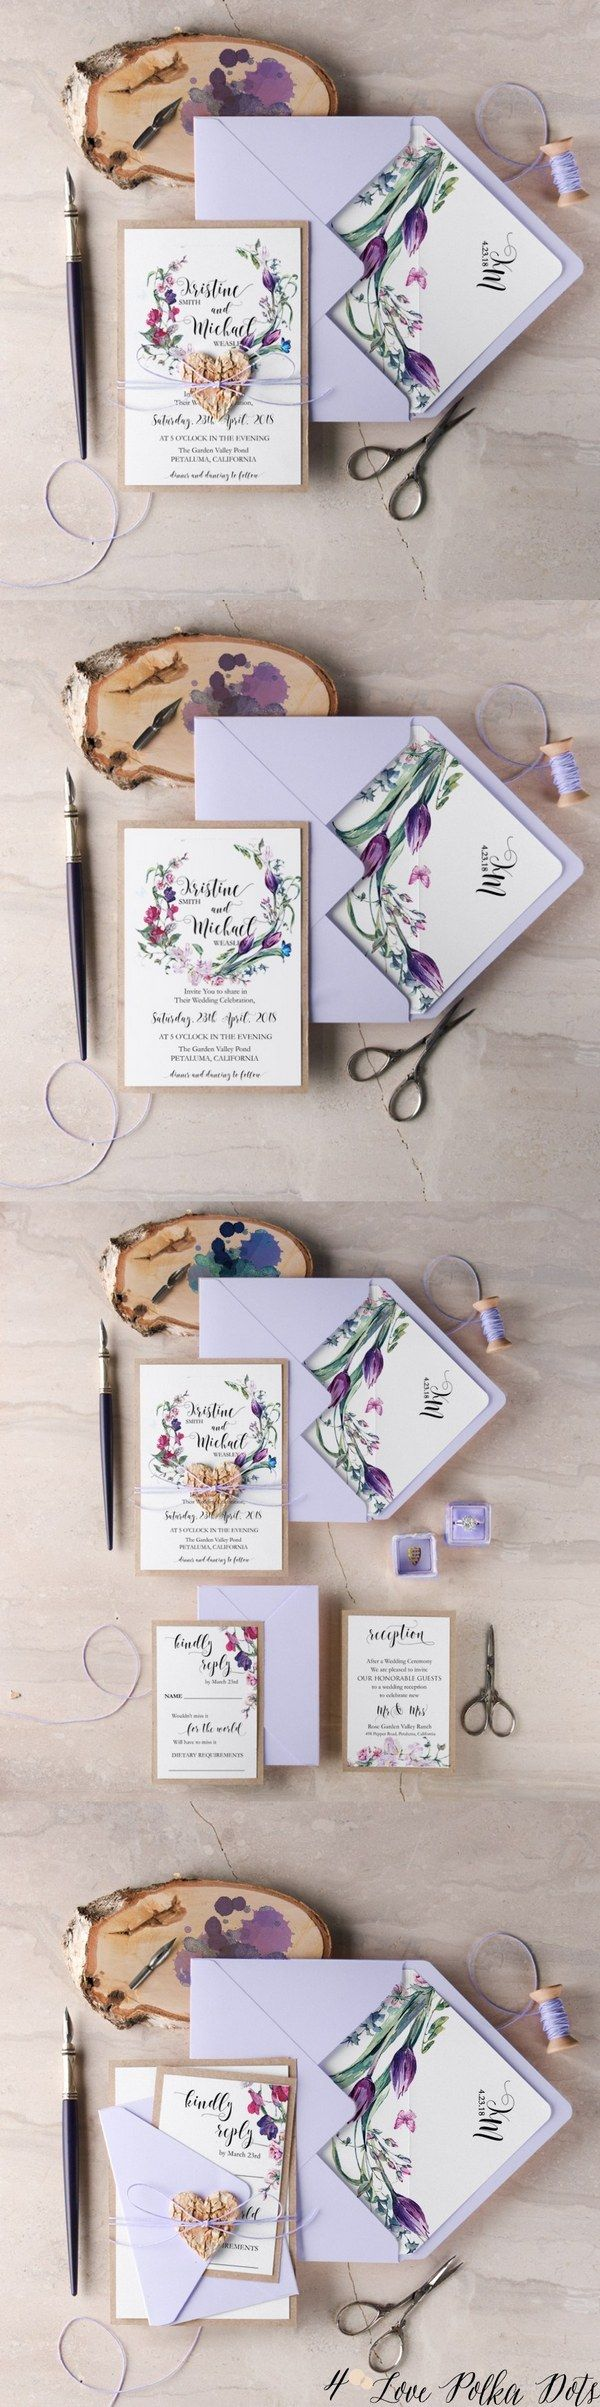 Lavender purple watercolor wedding invitations #purplewedding #lavenderwedding